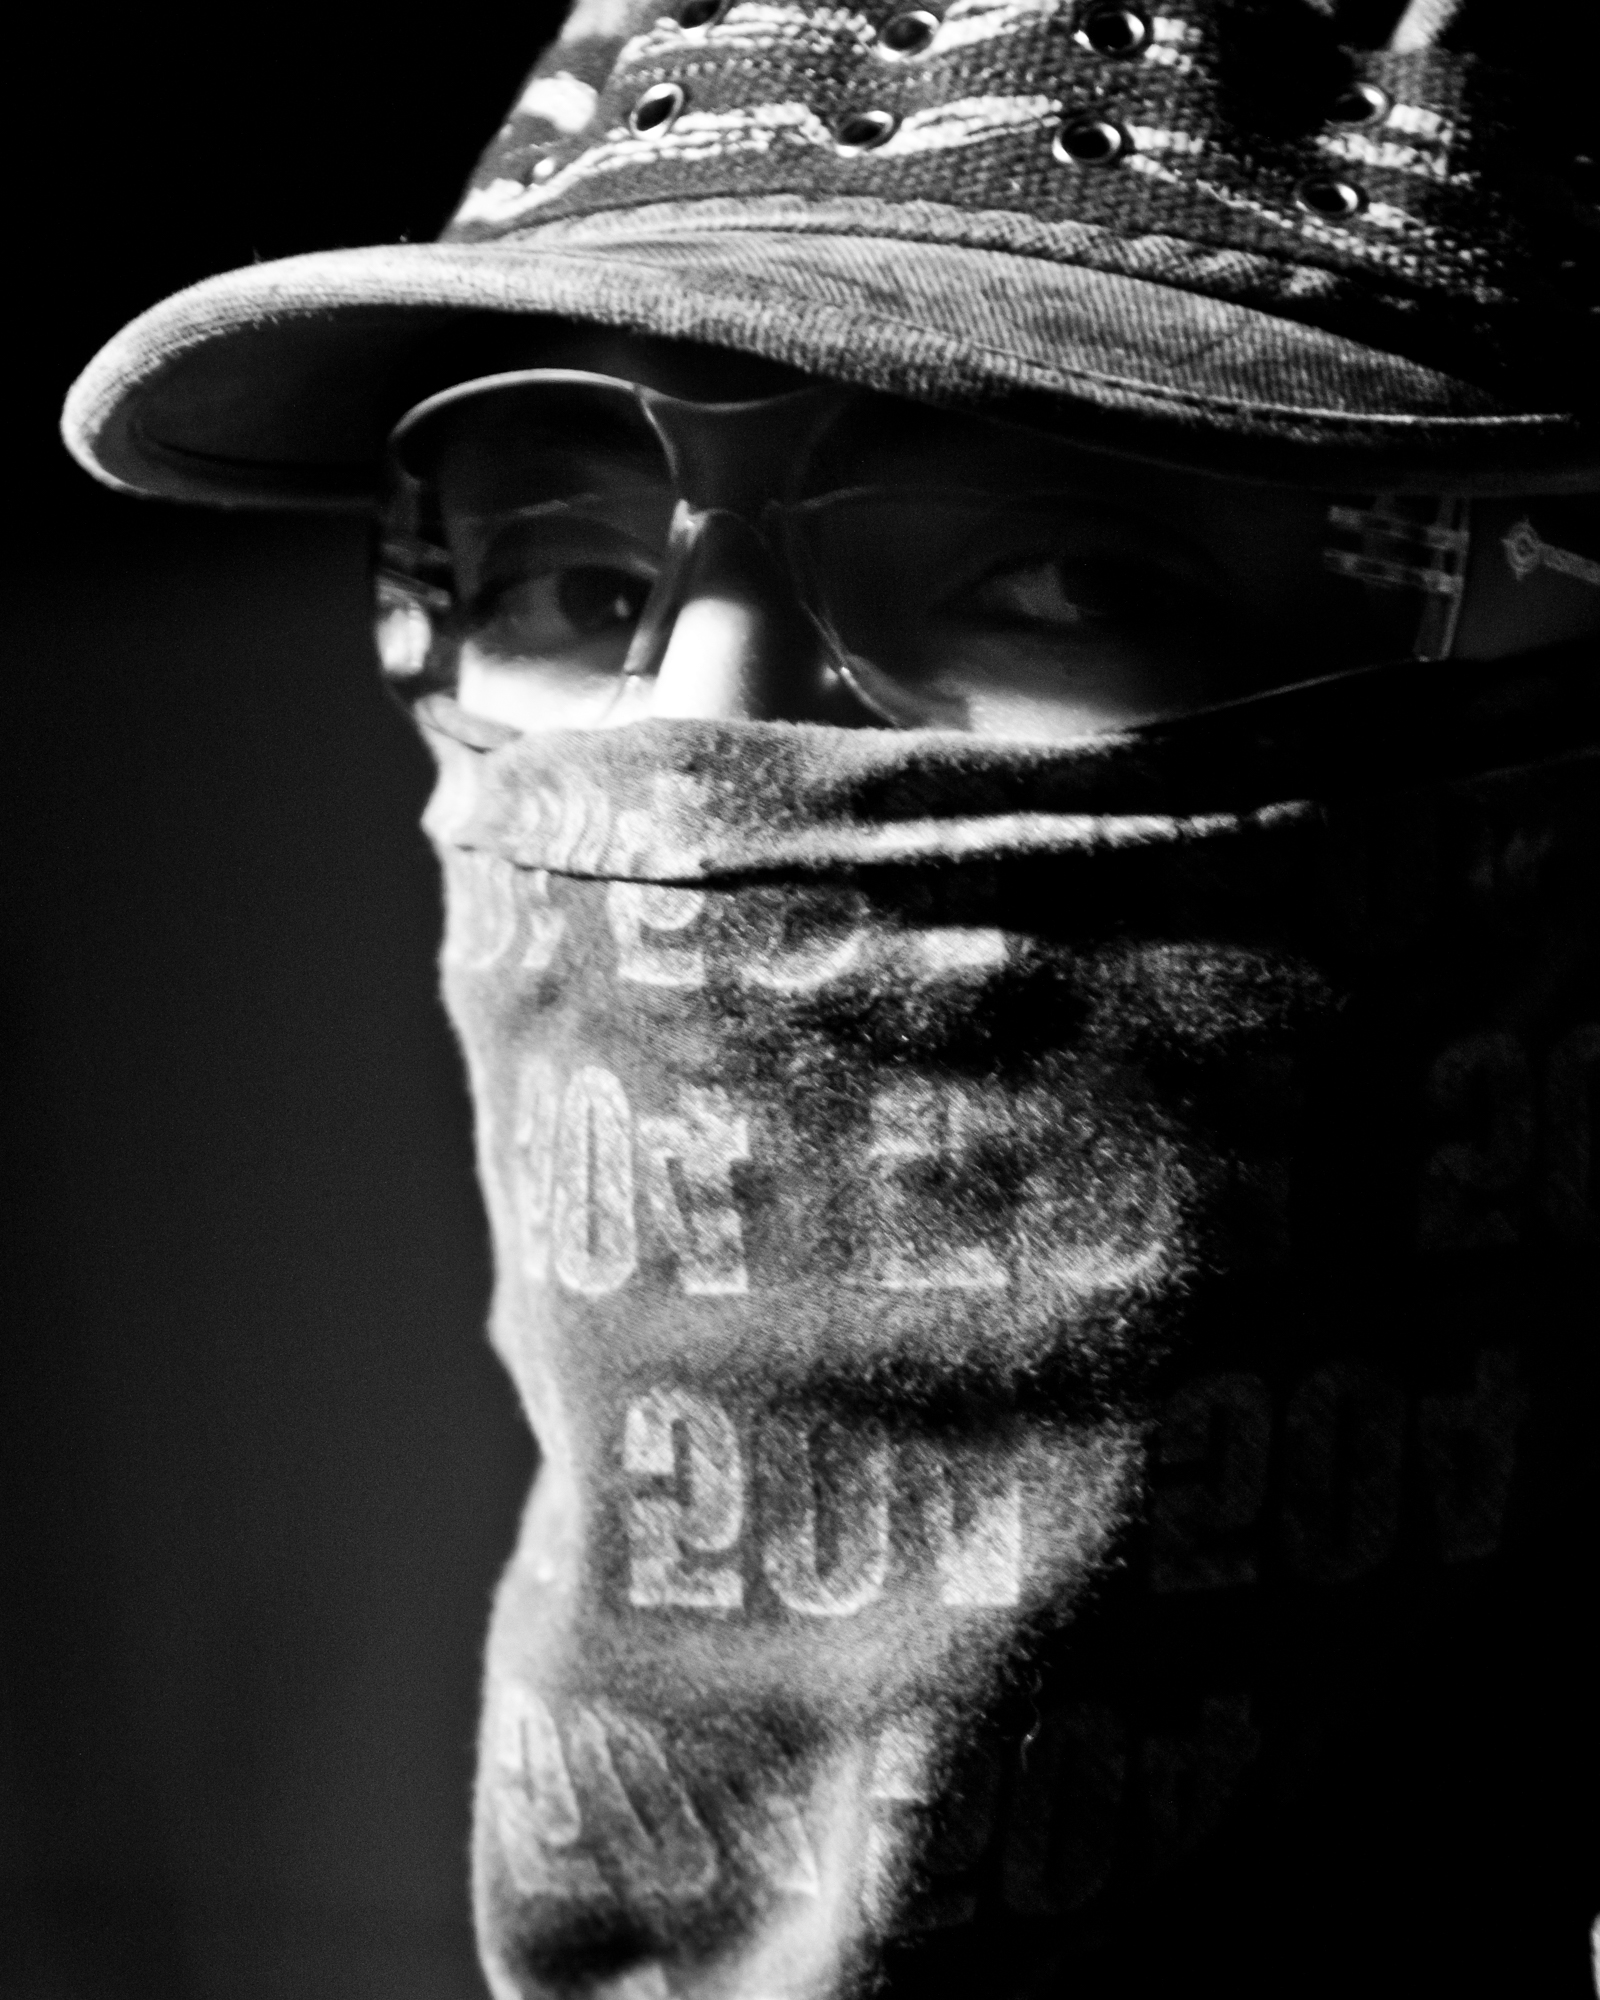 RPena_Portraiture_019.jpg